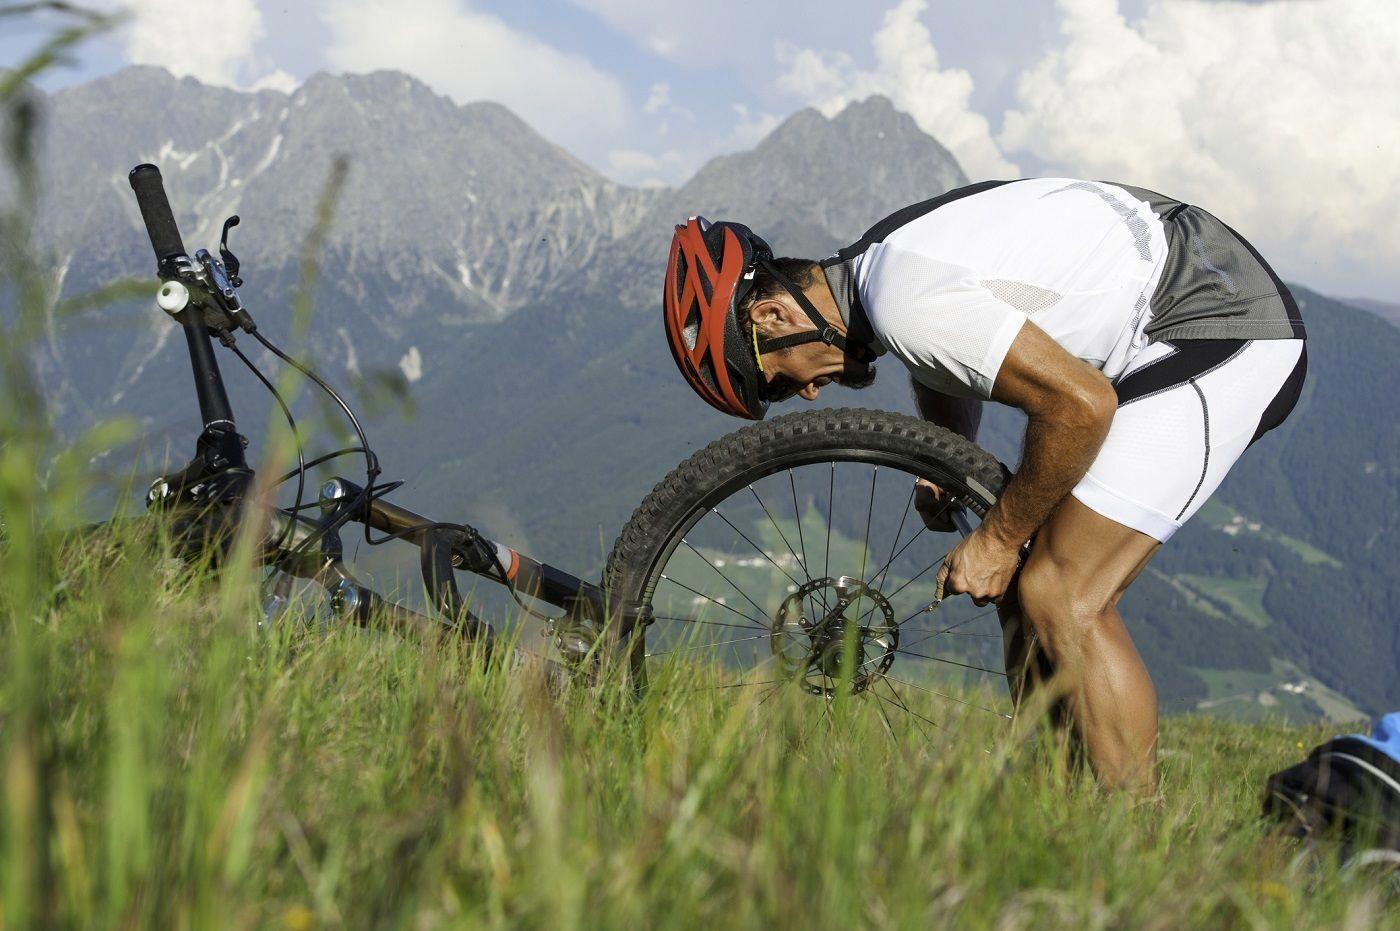 Best Mountain Bike Pump Coolbikeaccessories Roadbikeaccessories